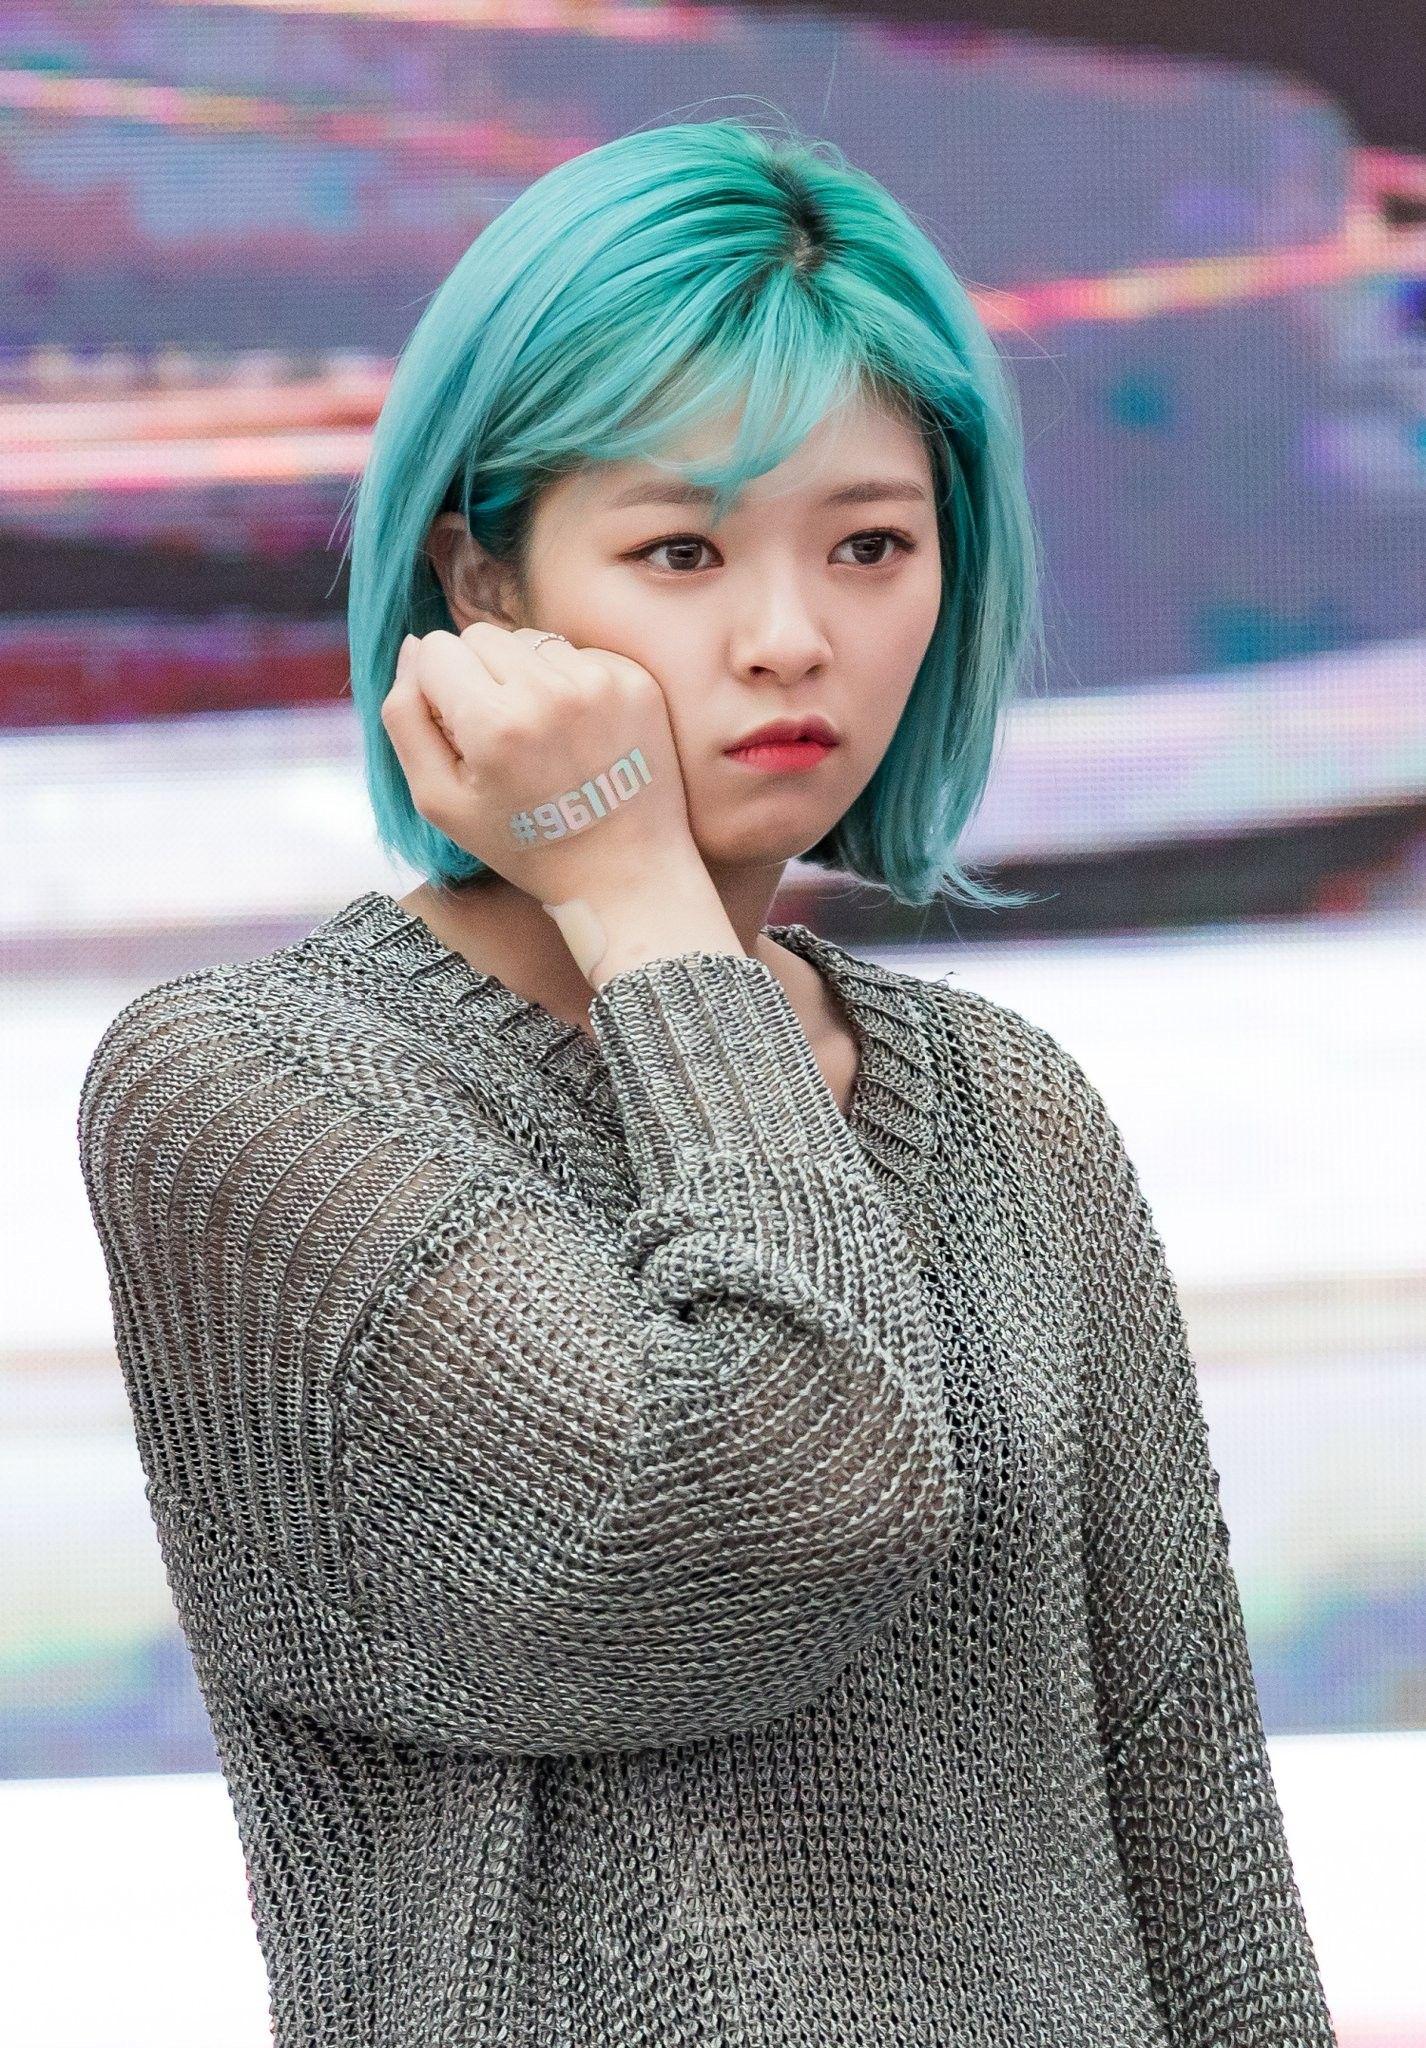 Twice jeongyeon whatislove fan signing goyang starfield